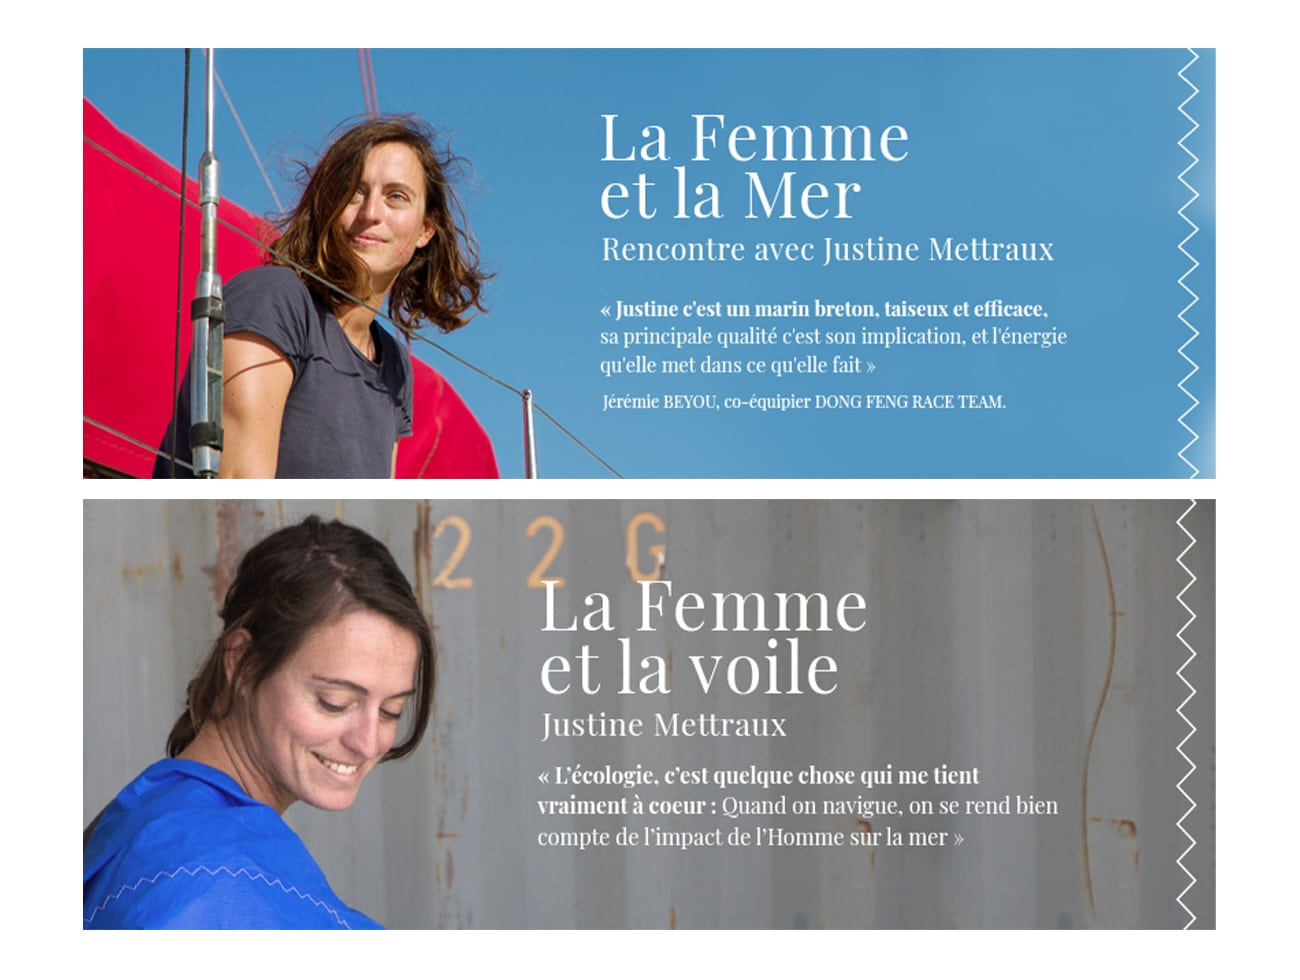 -727-justine-Mettraux-communication-bretagne-reseaux